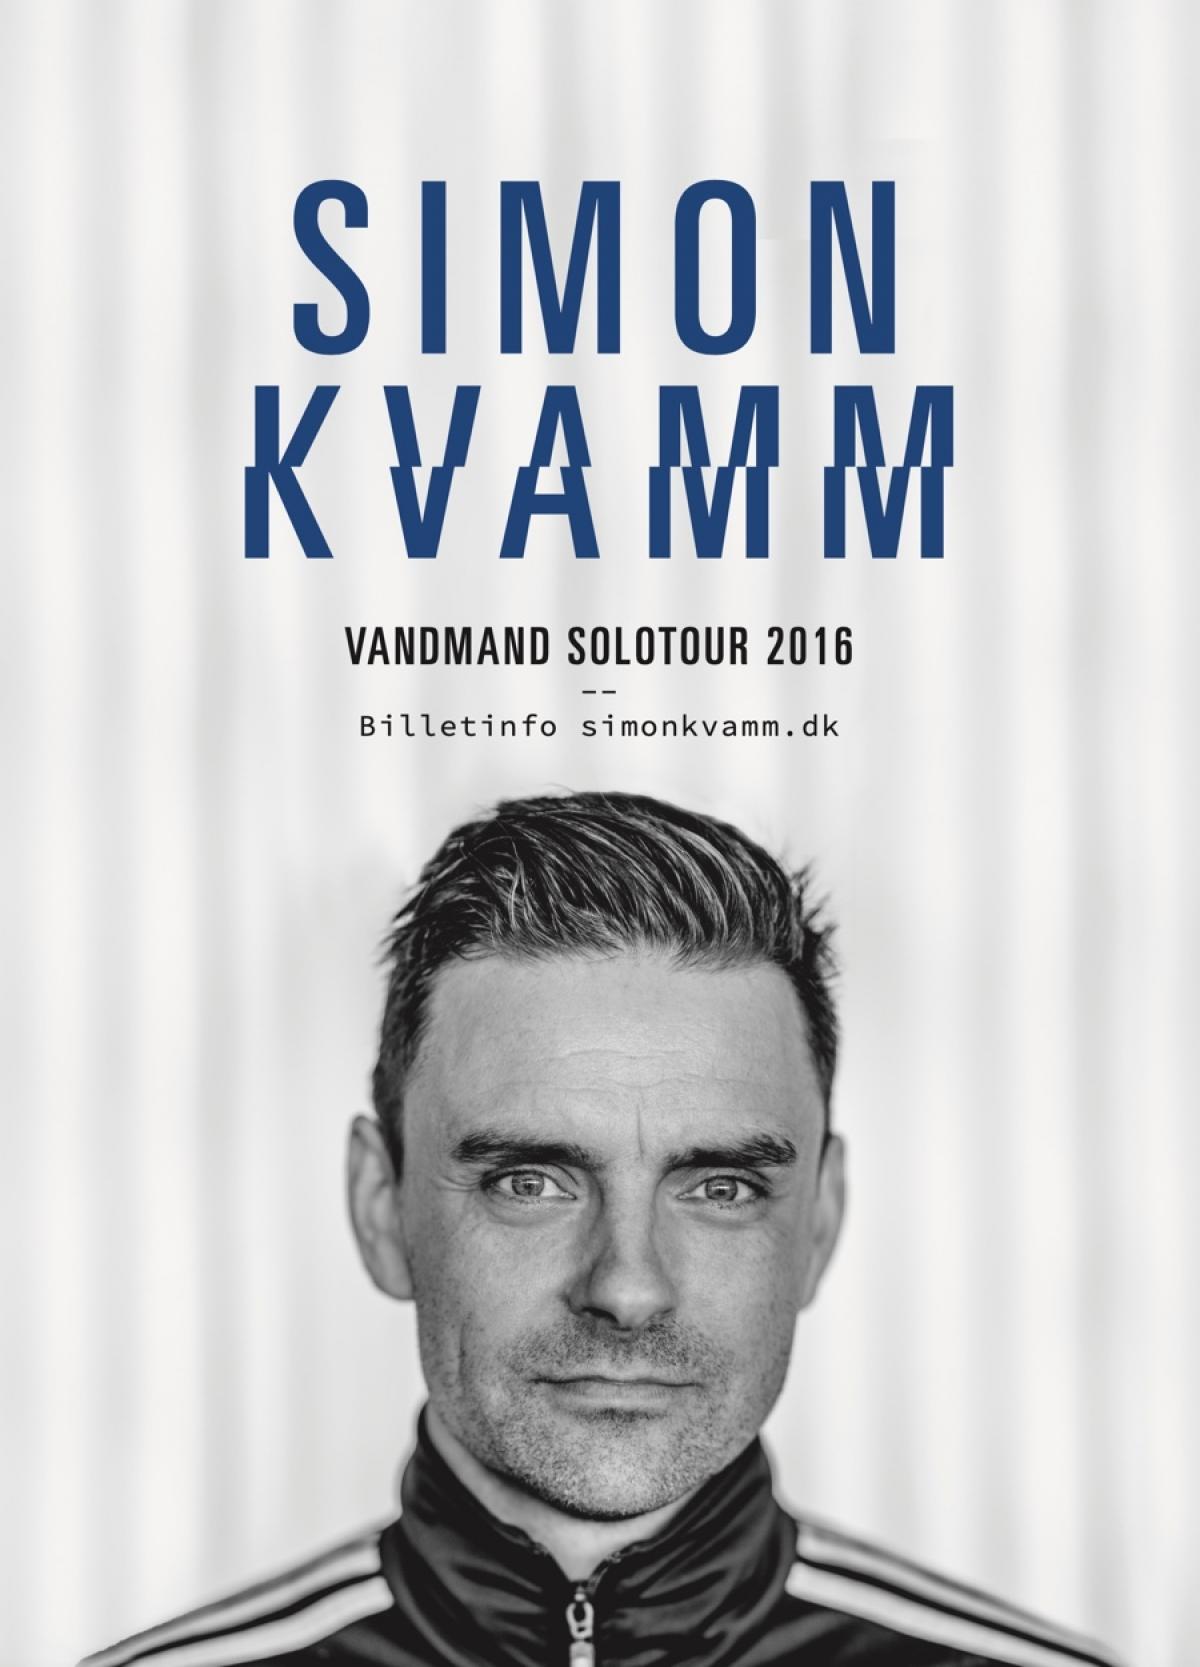 Simon Kvamm - Vandmand